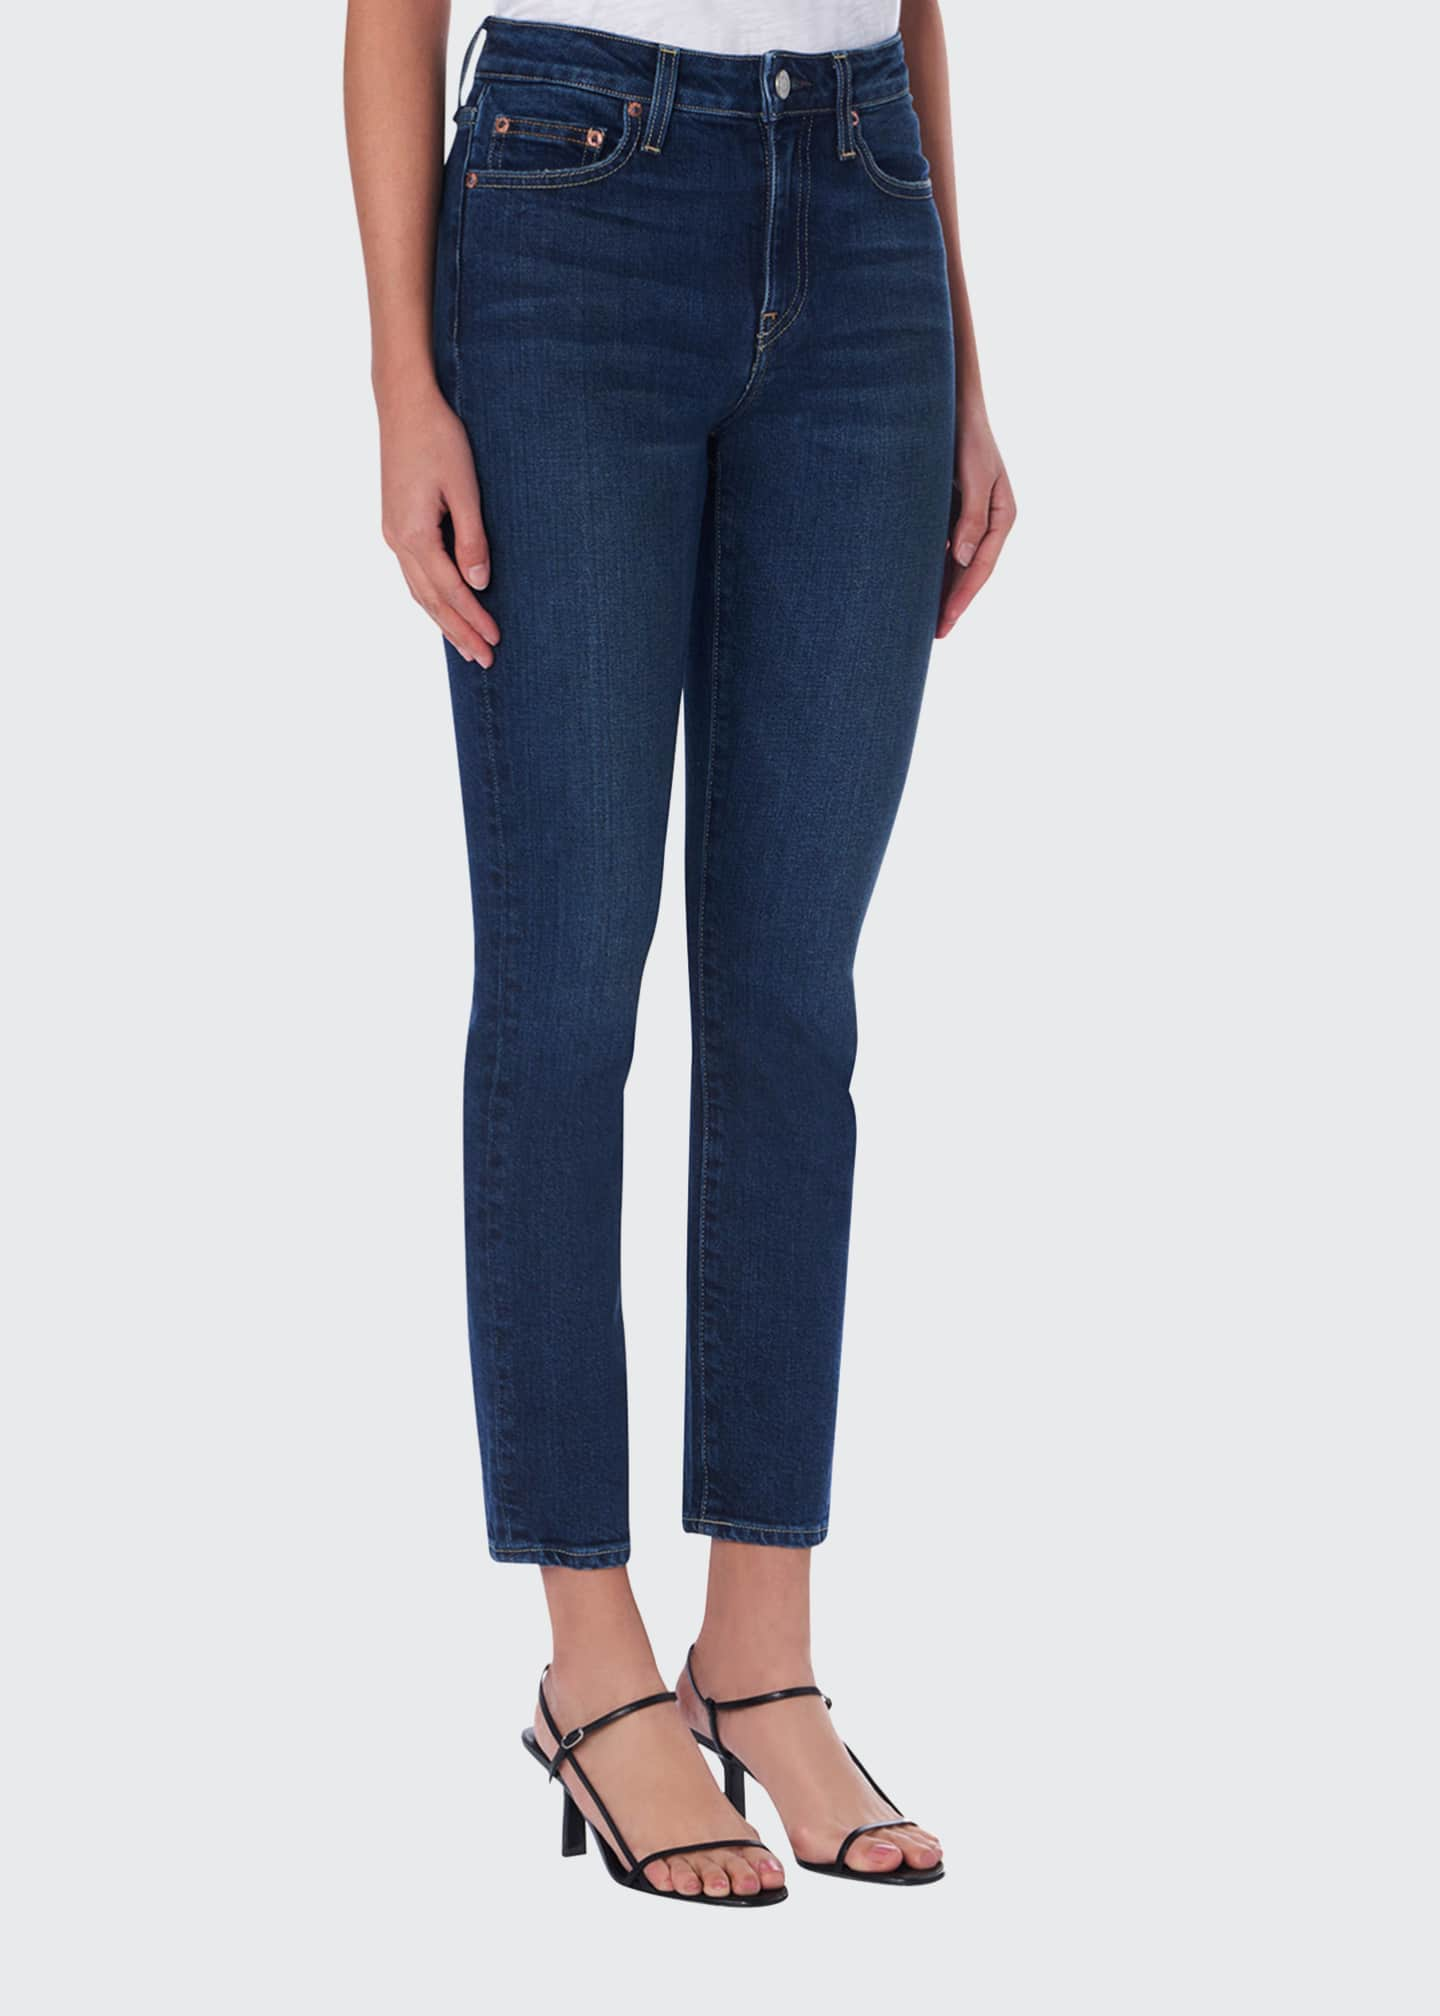 TRAVE Irina Mid-Rise Cigarette Jeans